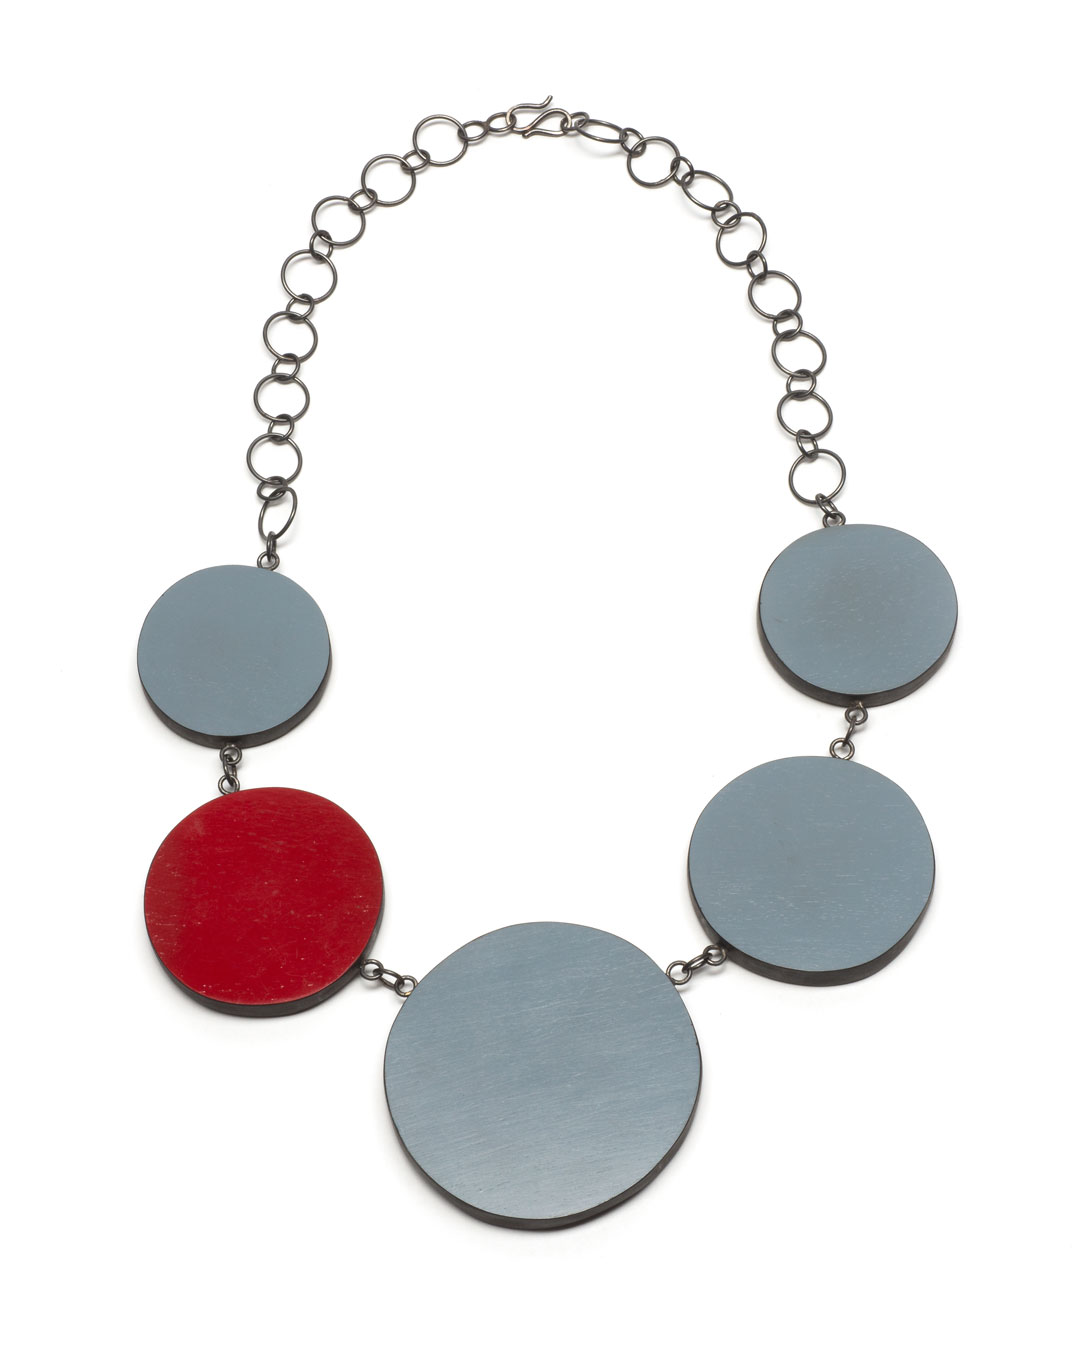 Mareen Alburg Duncker, Mikado Red II, 2018, necklace; ebony, silver, lacquer, thread, ø 600 mm, €490